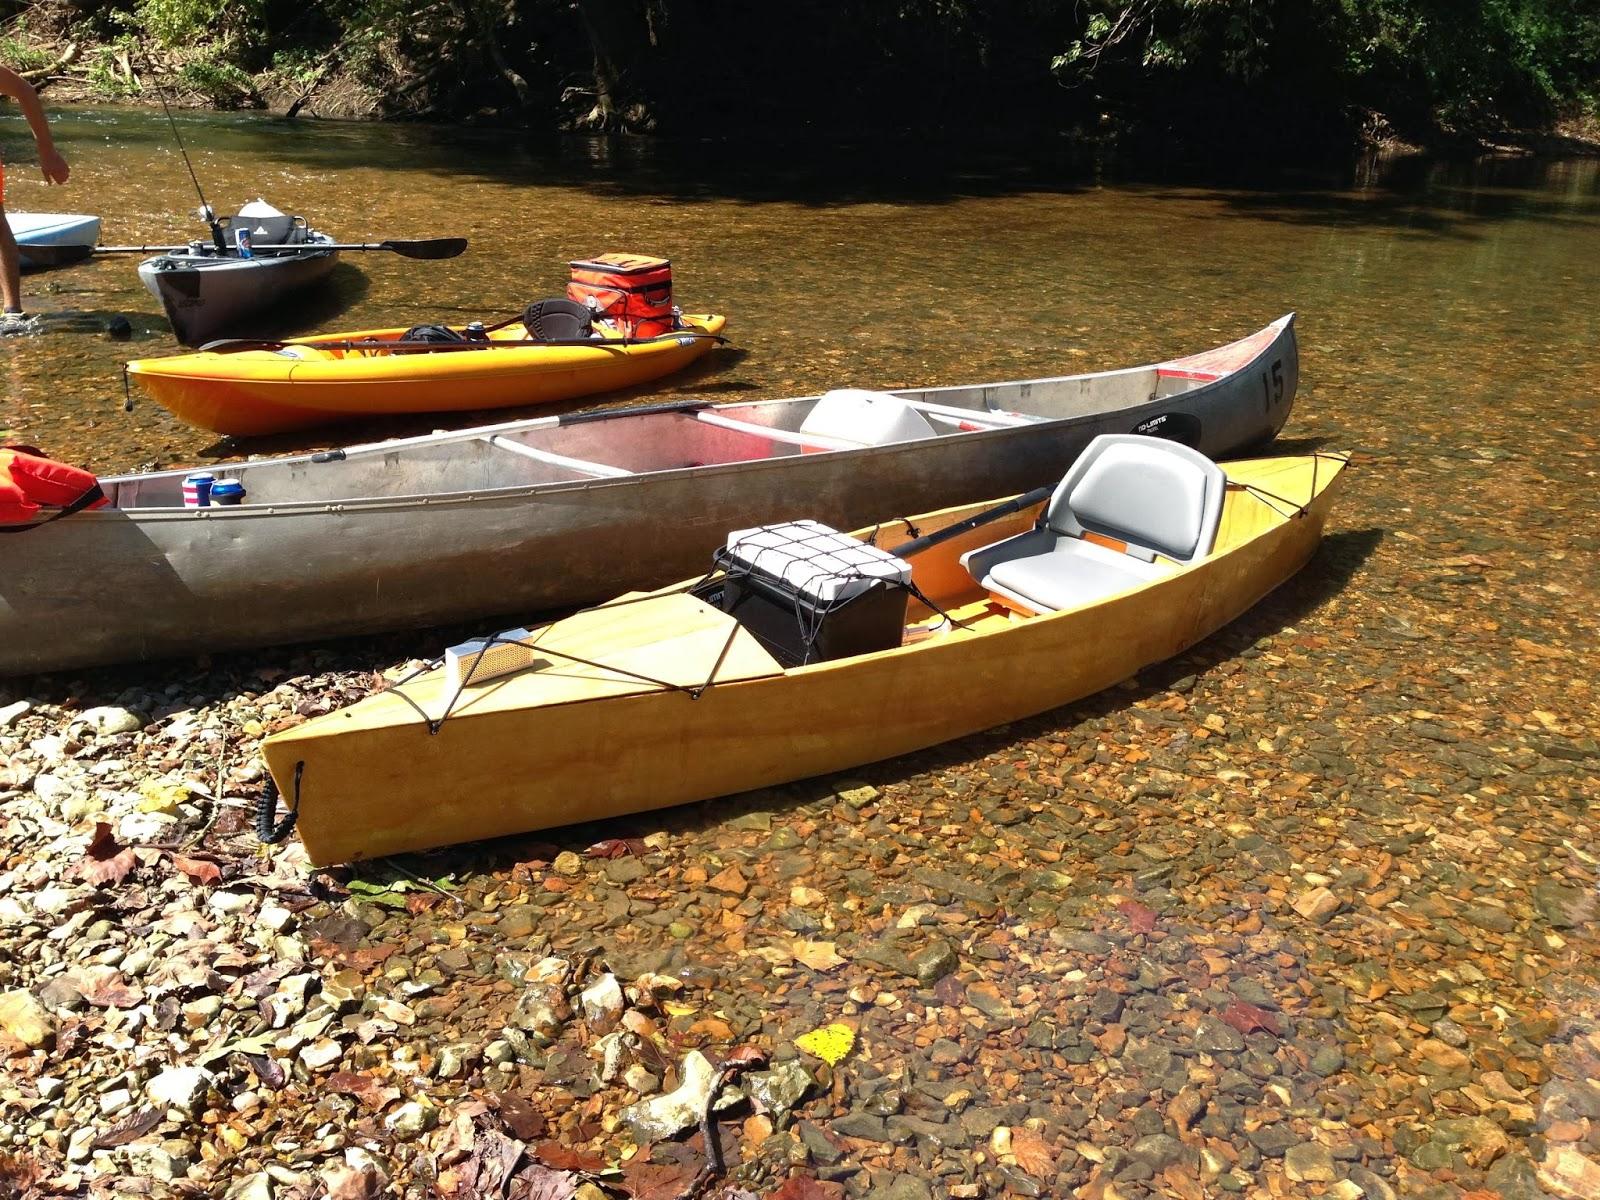 Stitch+and+Glue+Kayaks+Baidarka Drew's Projects: Stitch and glue kayak